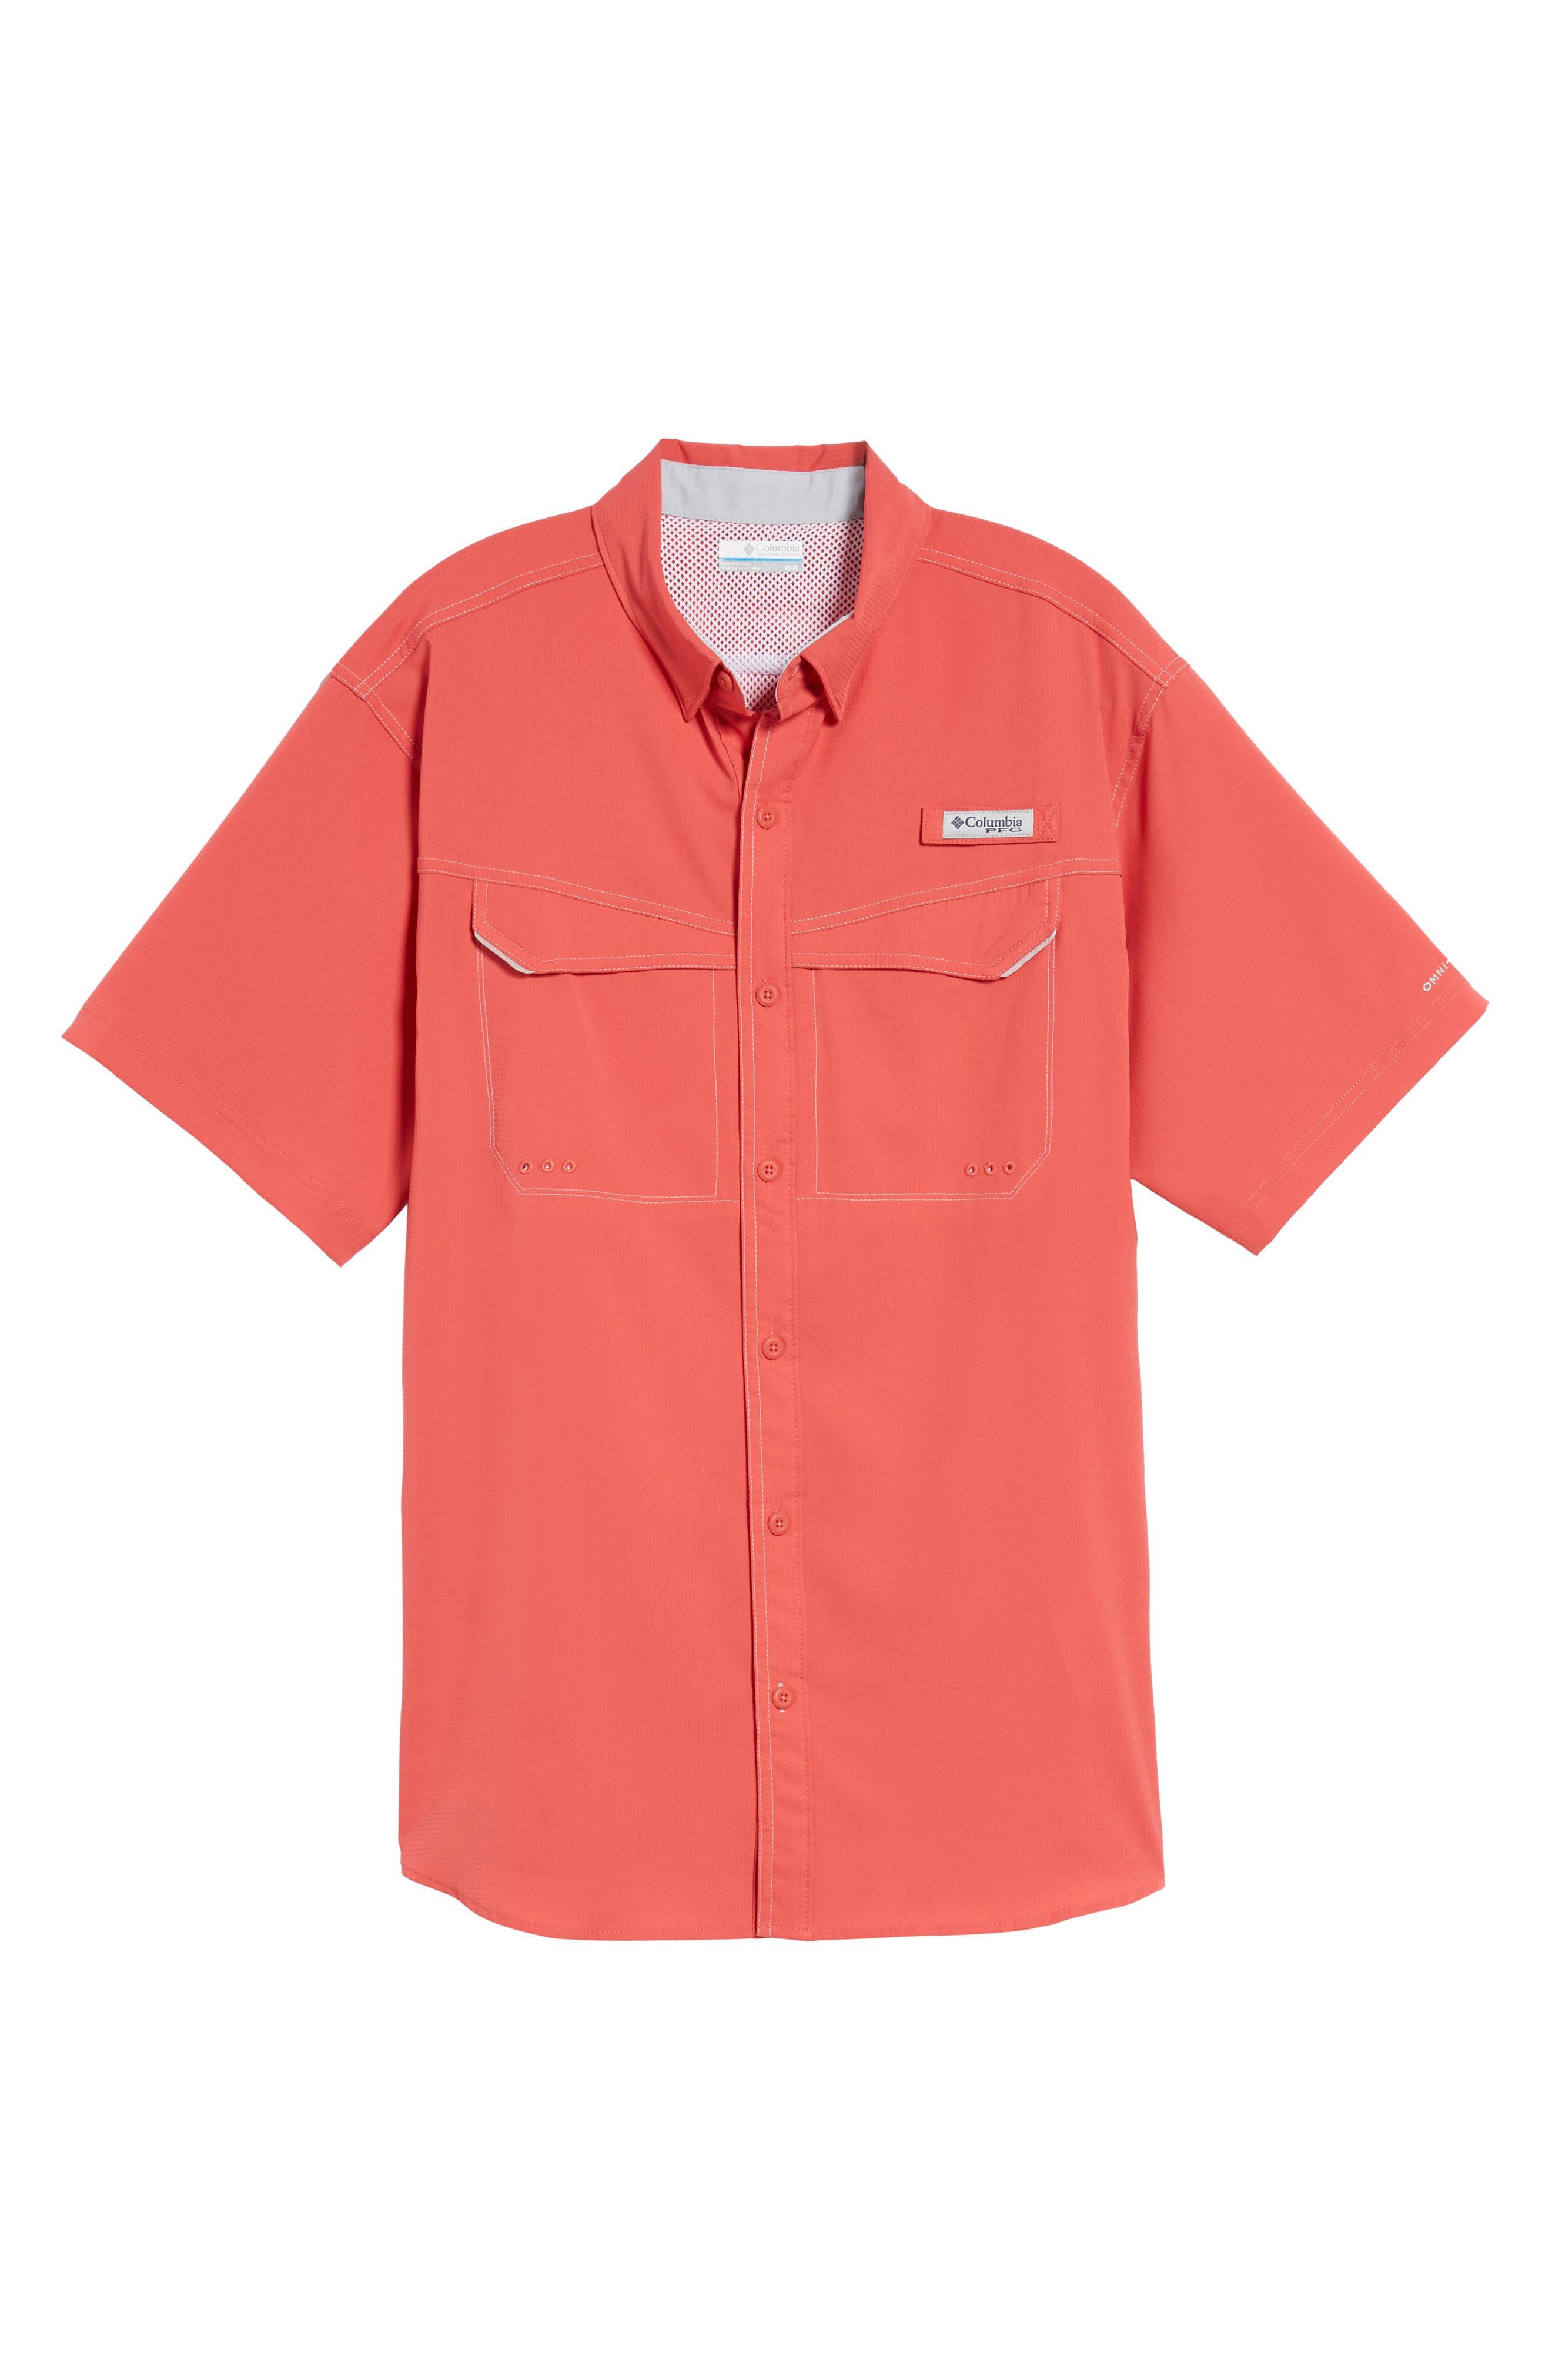 PFG Low Drag Offshore Woven Shirt,                             Alternate thumbnail 29, color,